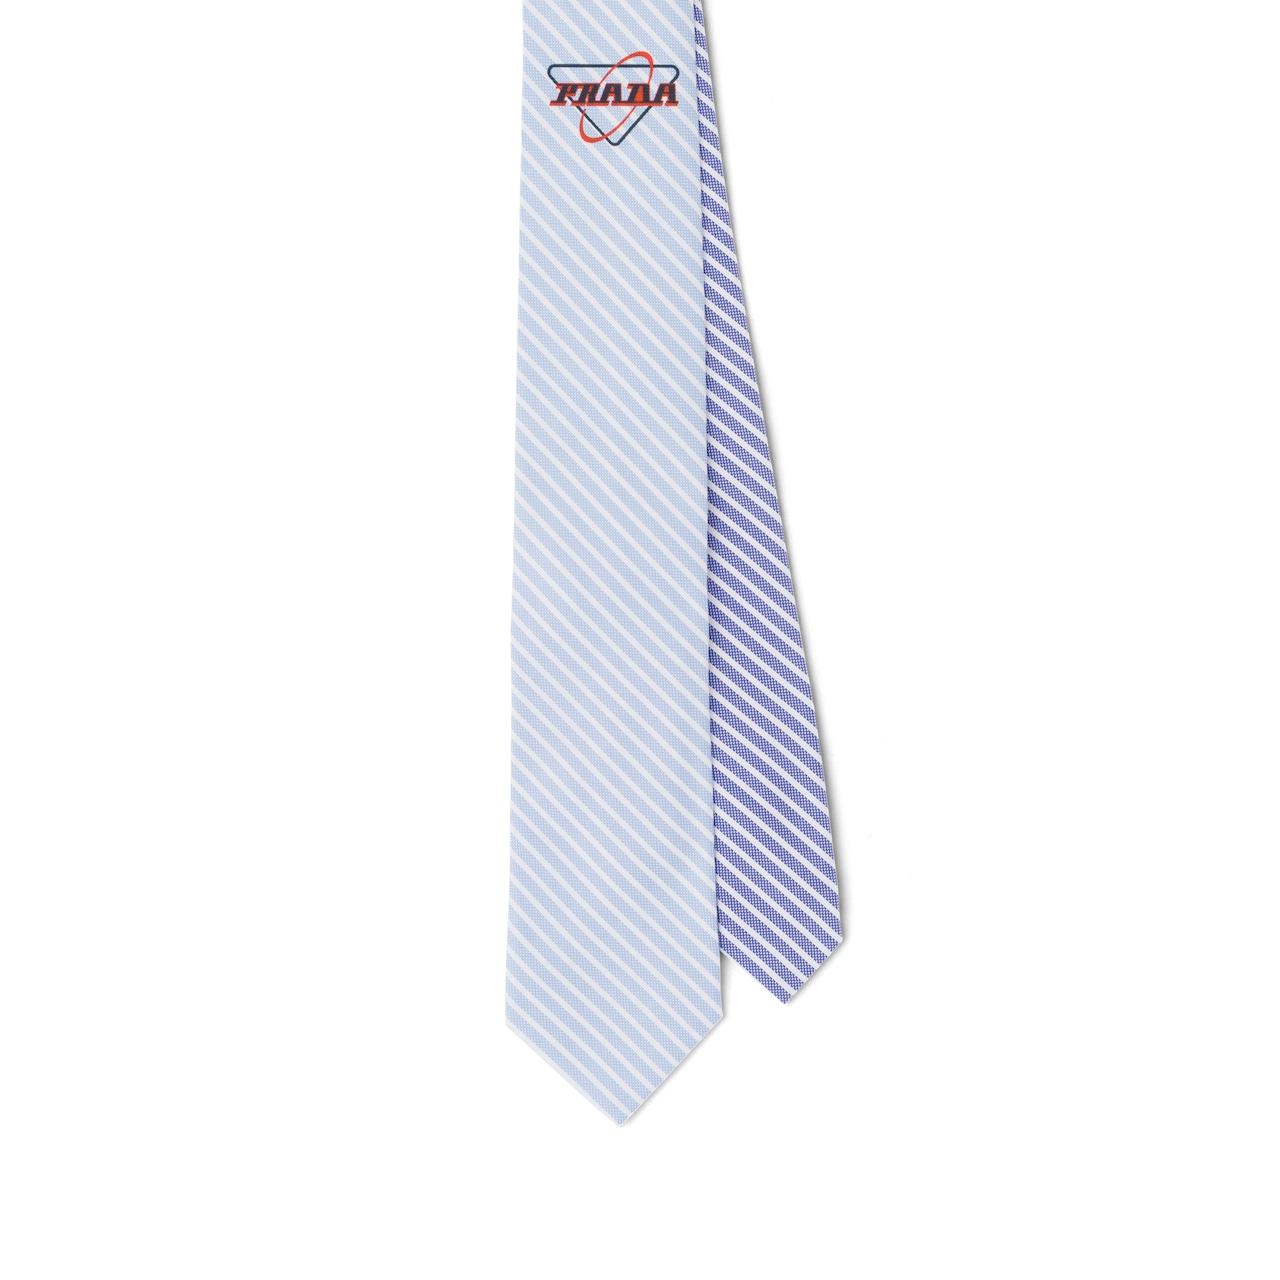 Prada 牛津布领带 1